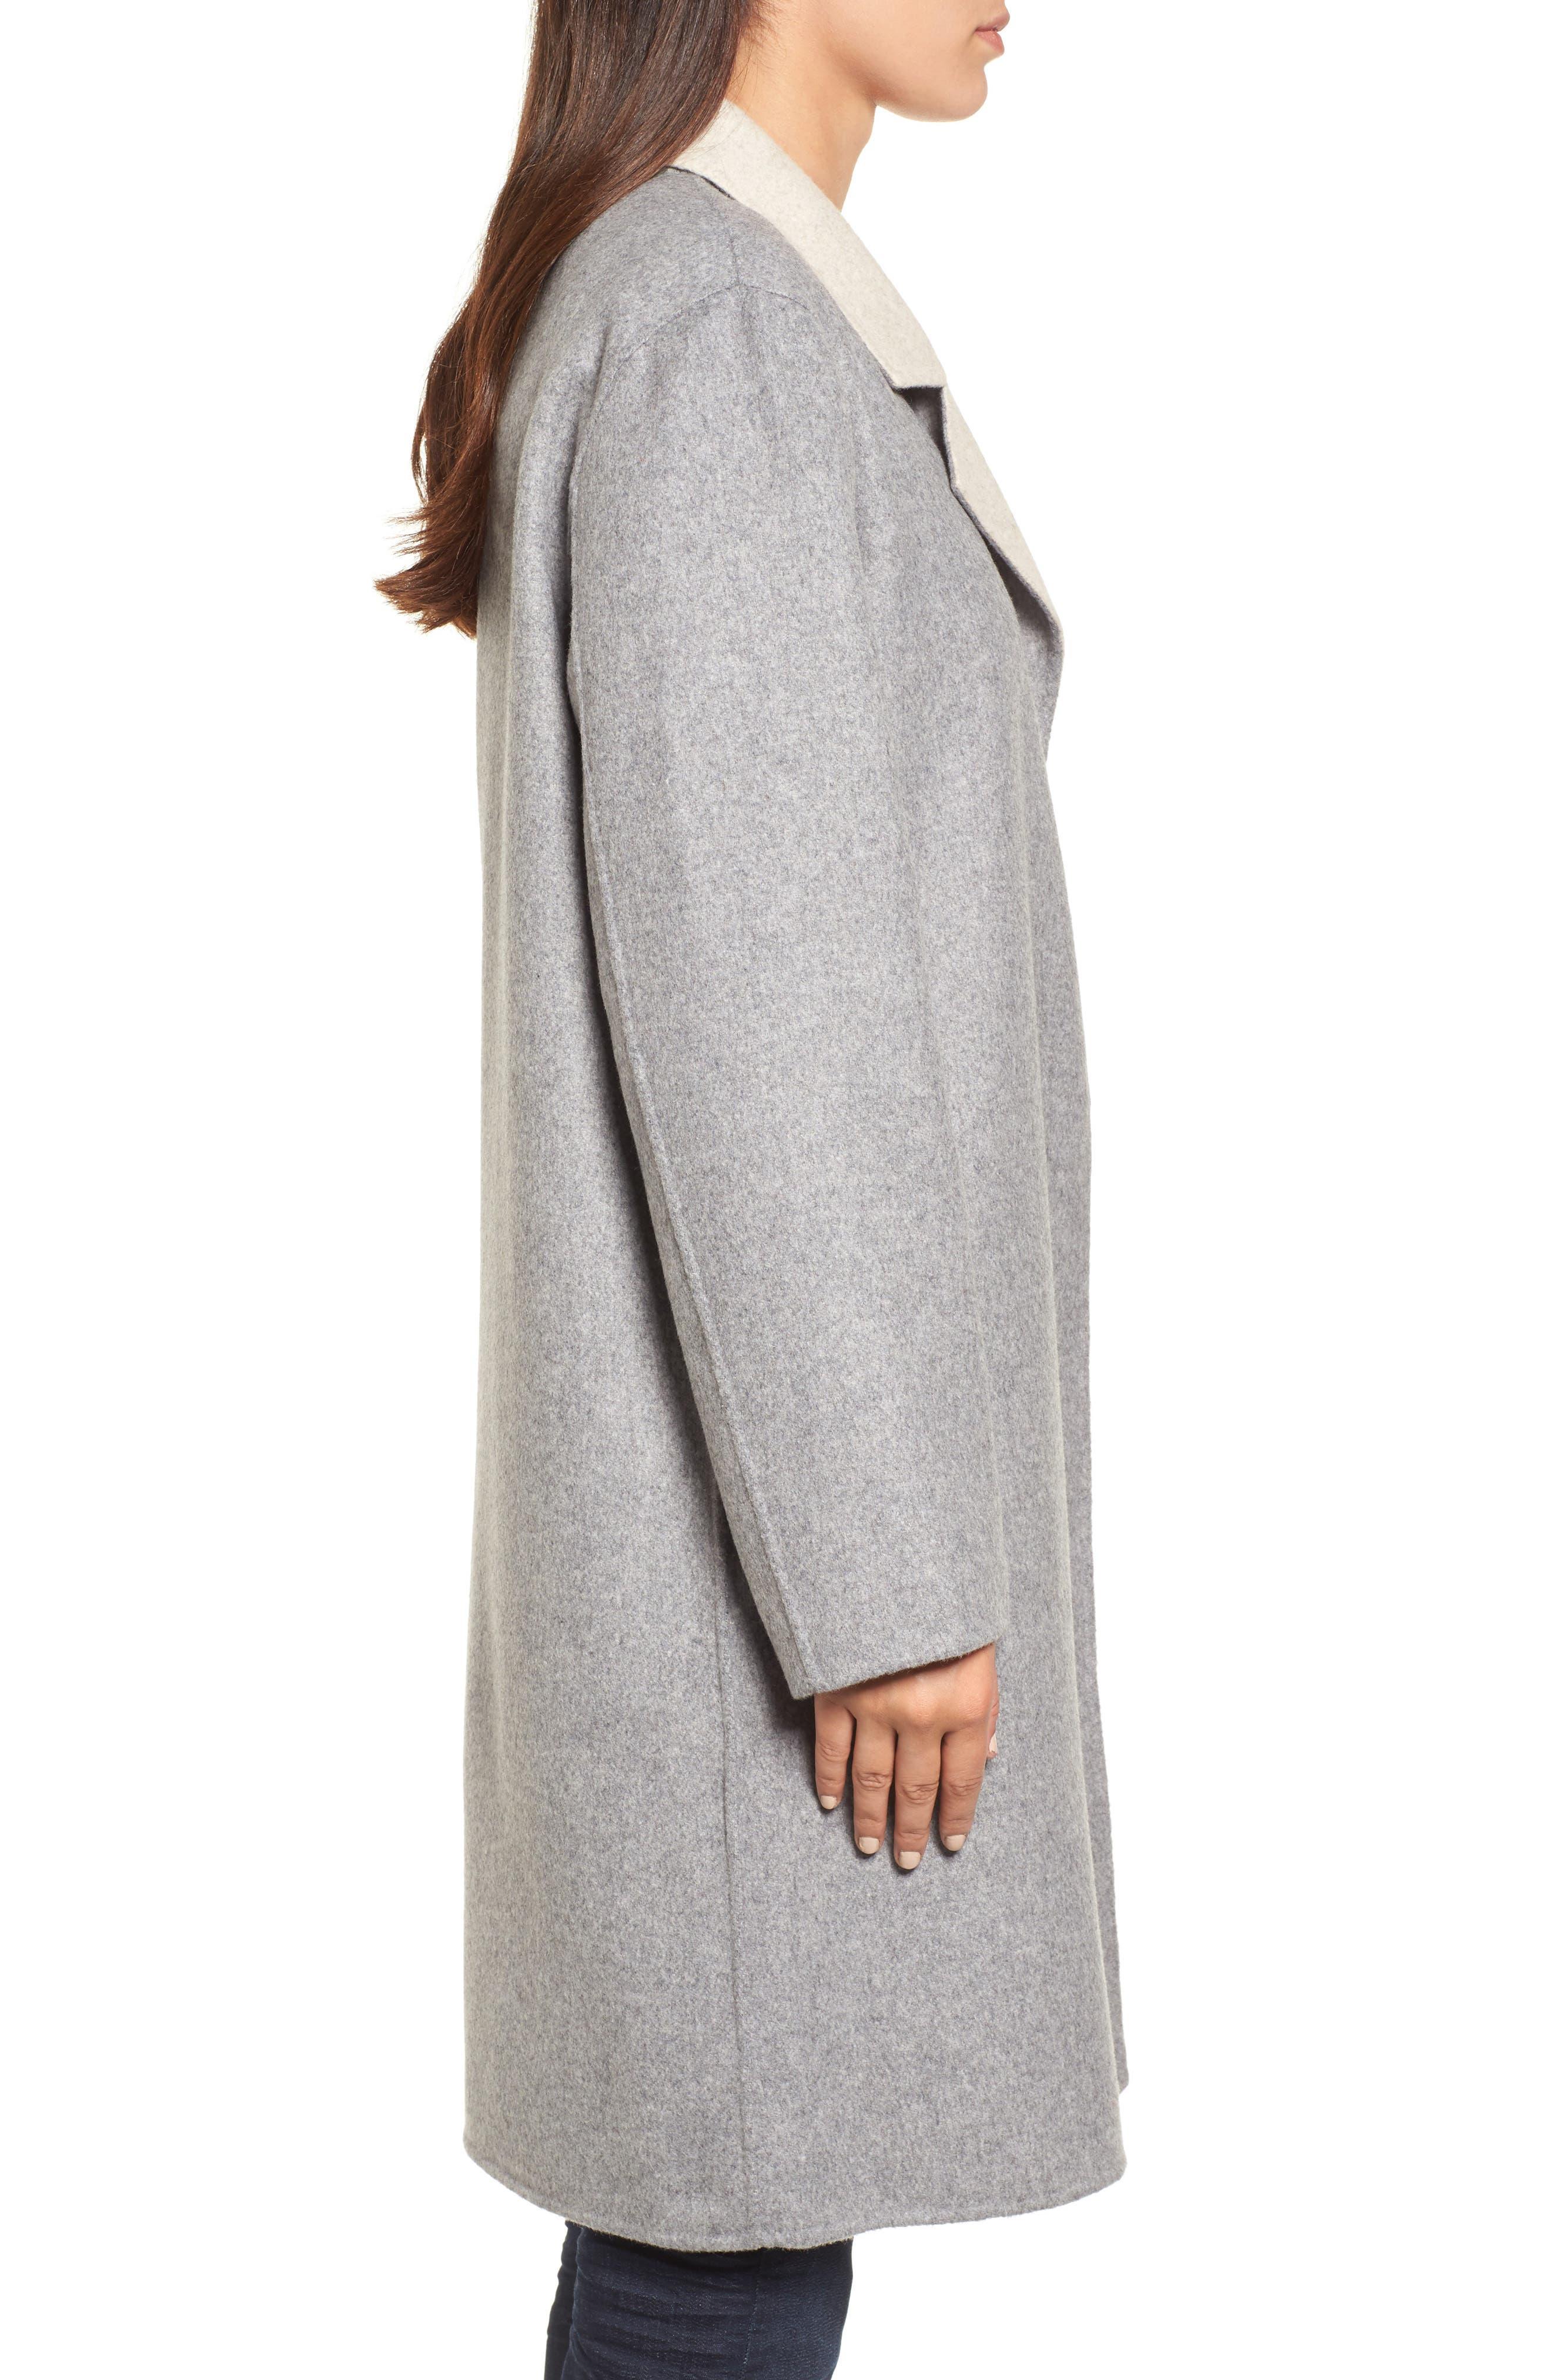 Notch Collar Long Wool Blend Jacket,                             Alternate thumbnail 4, color,                             Dark Pearl/ Maple Oat